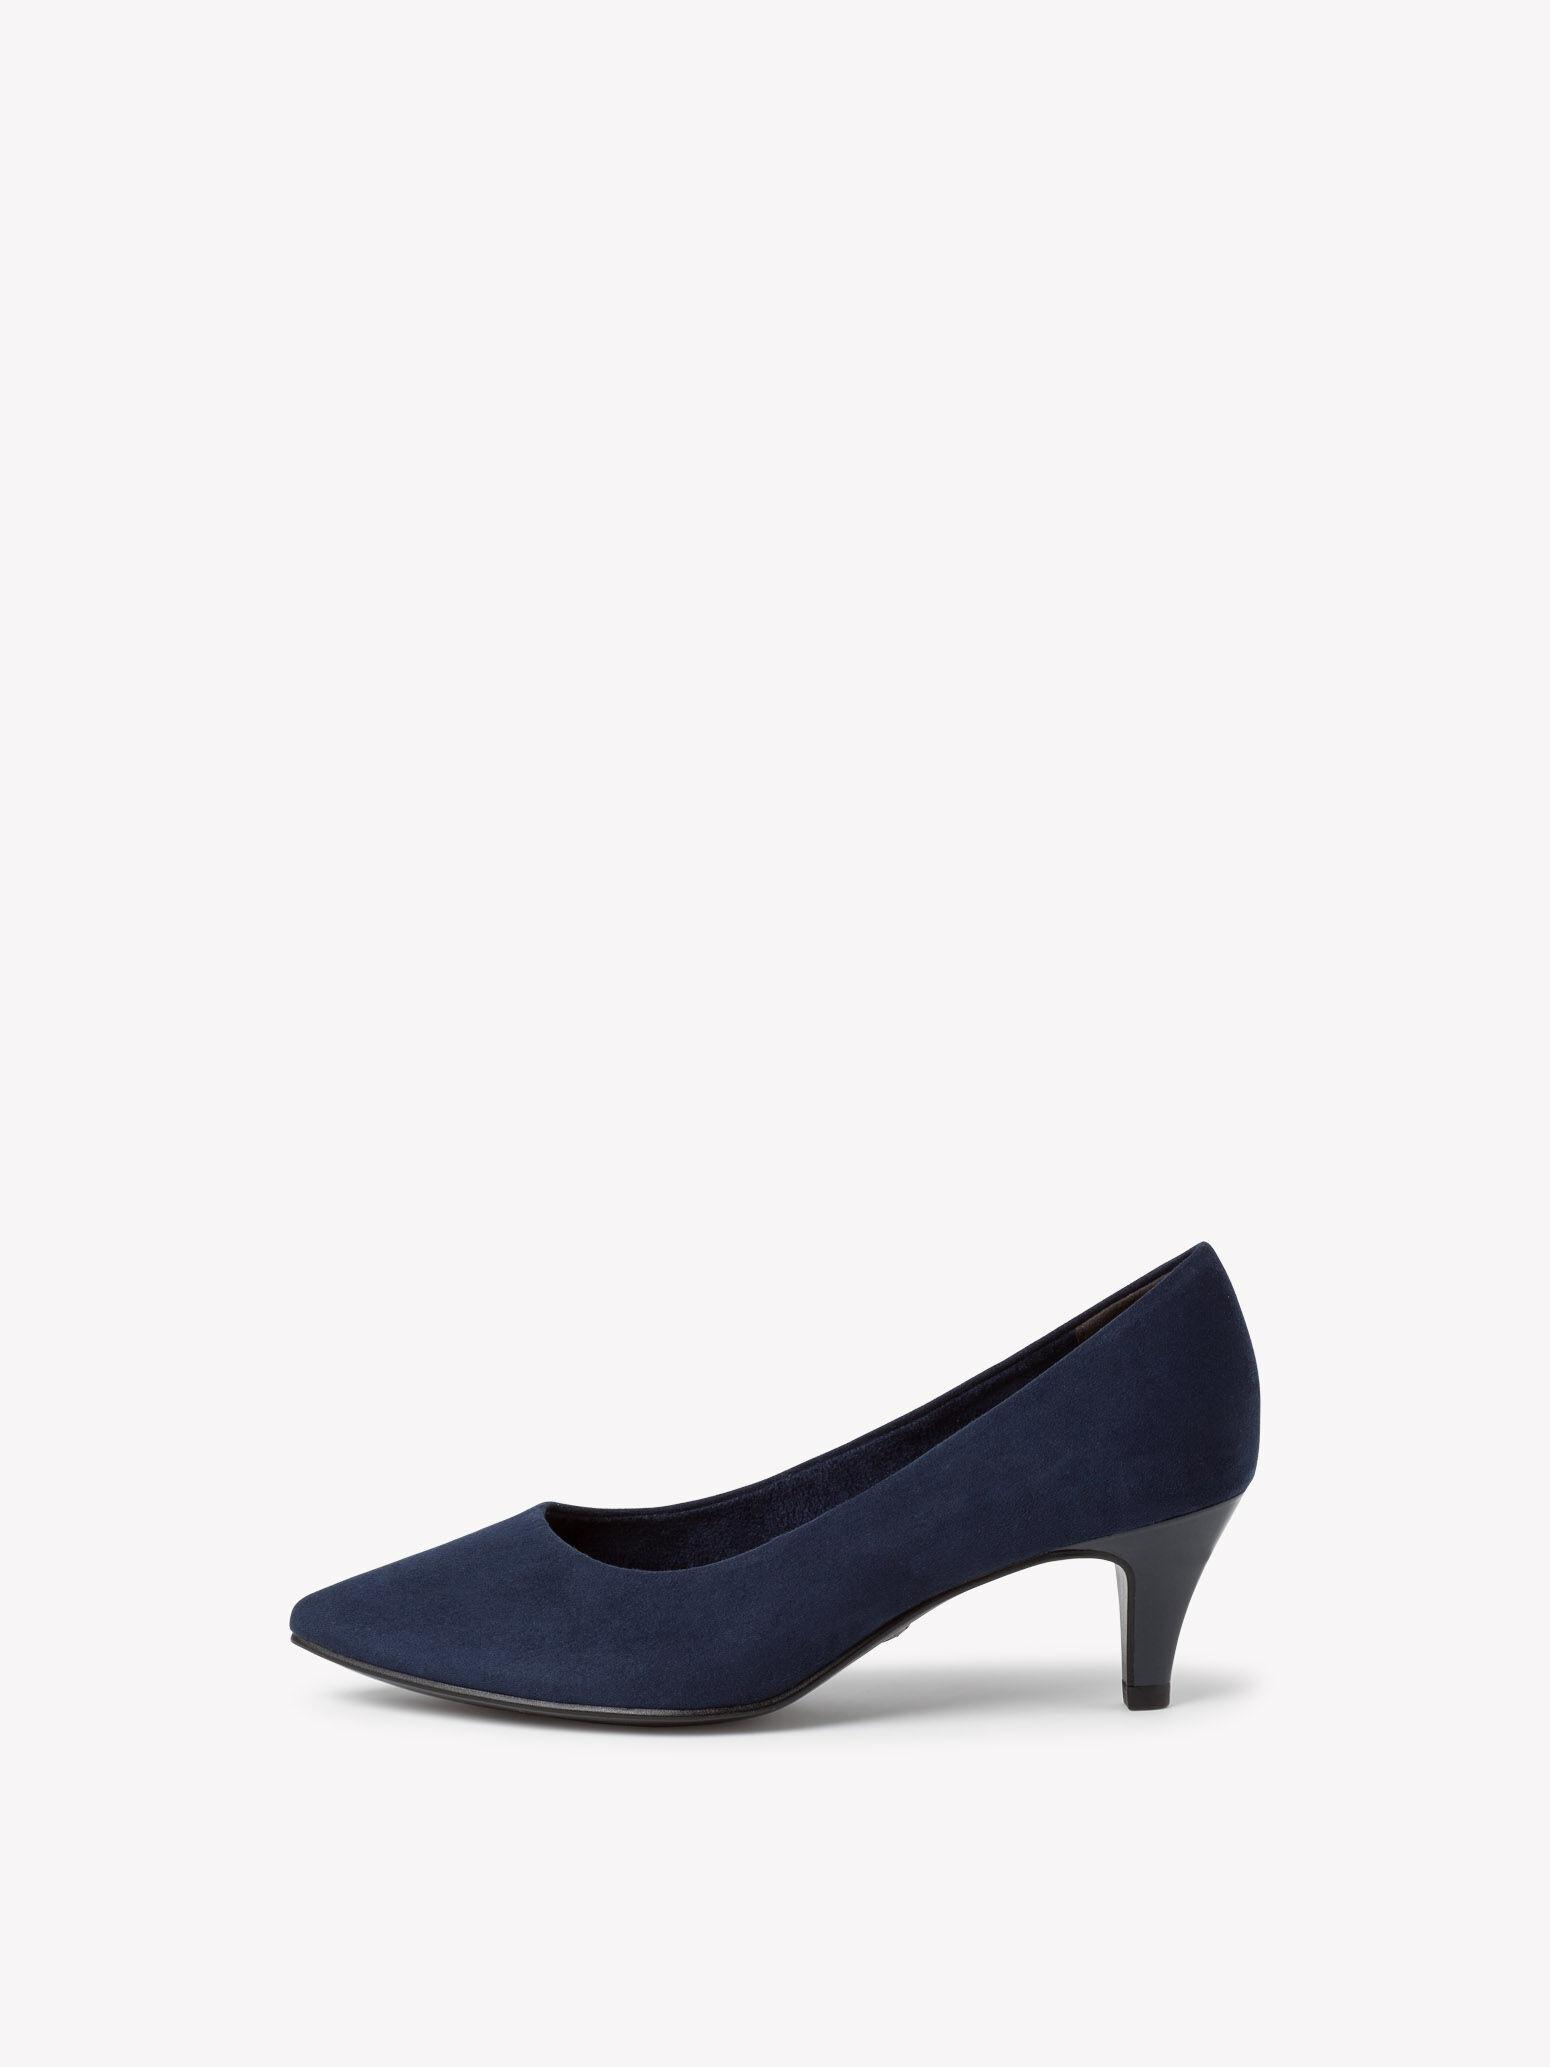 2019 Damen TAMARIS Keilsandaletten Großhandel Blau